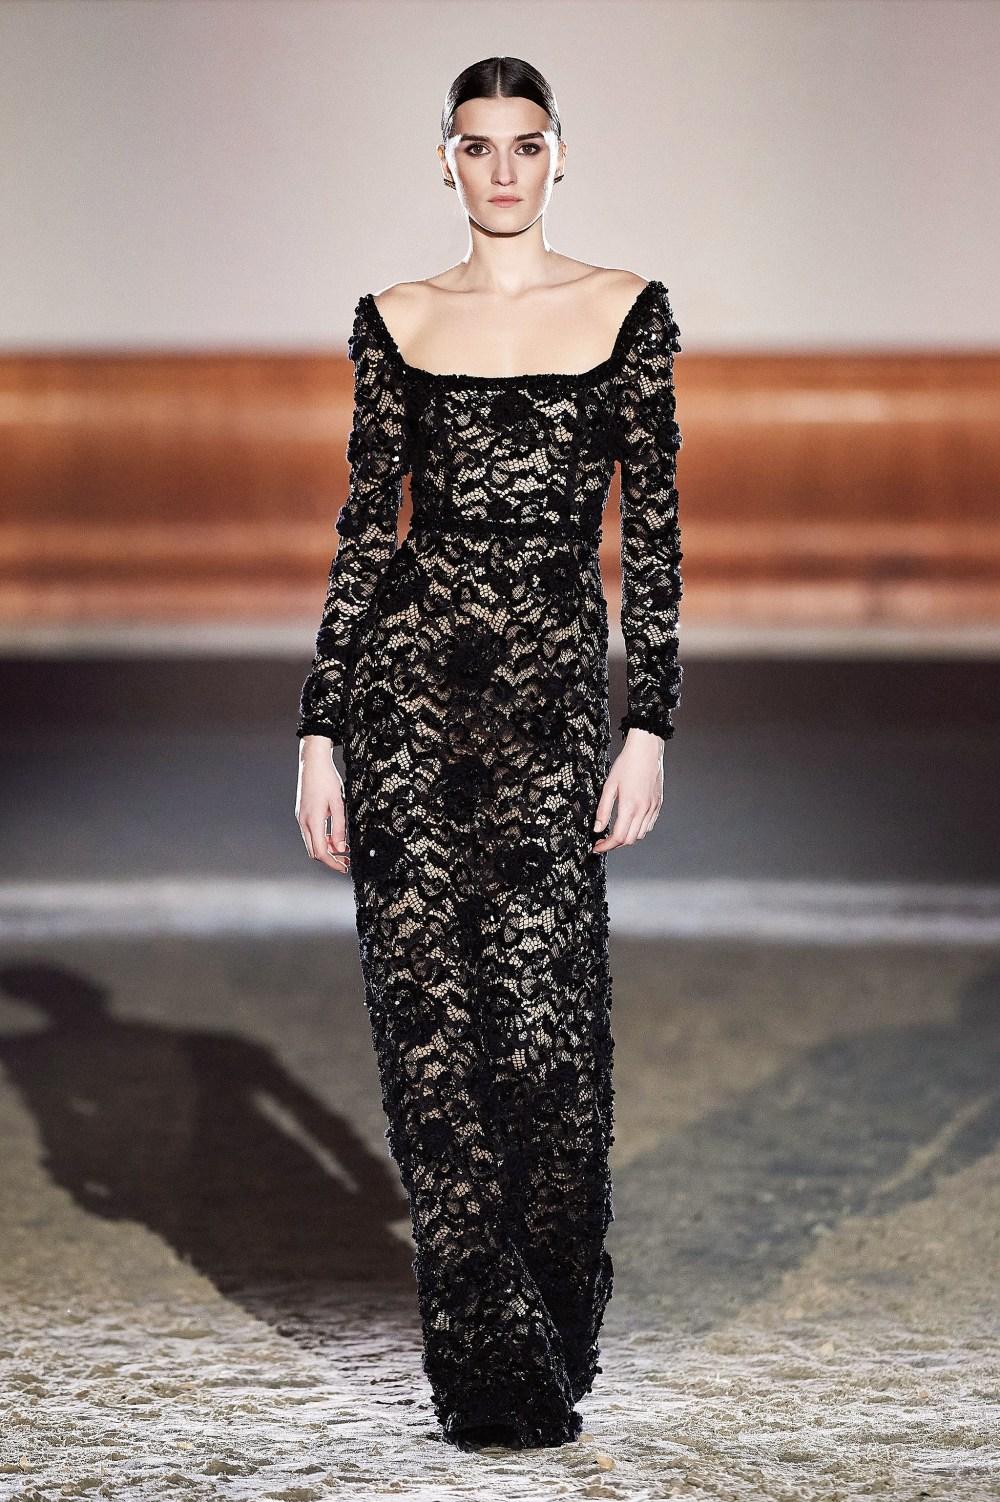 Elisabetta Franchi: Elisabetta Franchi Fall Winter 2021-22 Fashion Show Photo #55